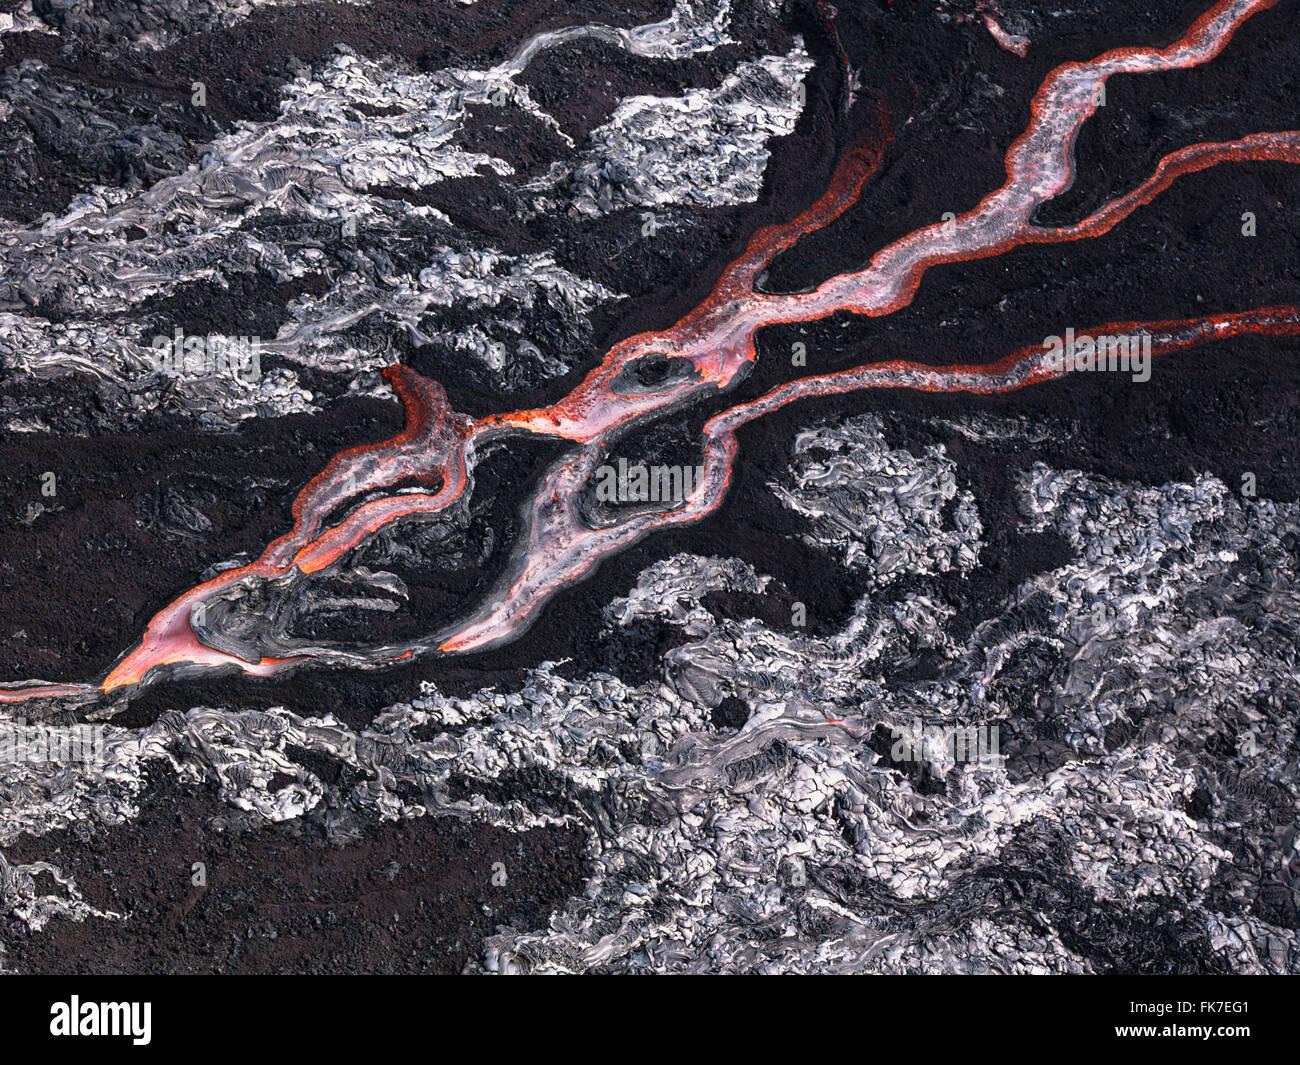 Lava flow at Hawaii Volcano National Park - Stock Image